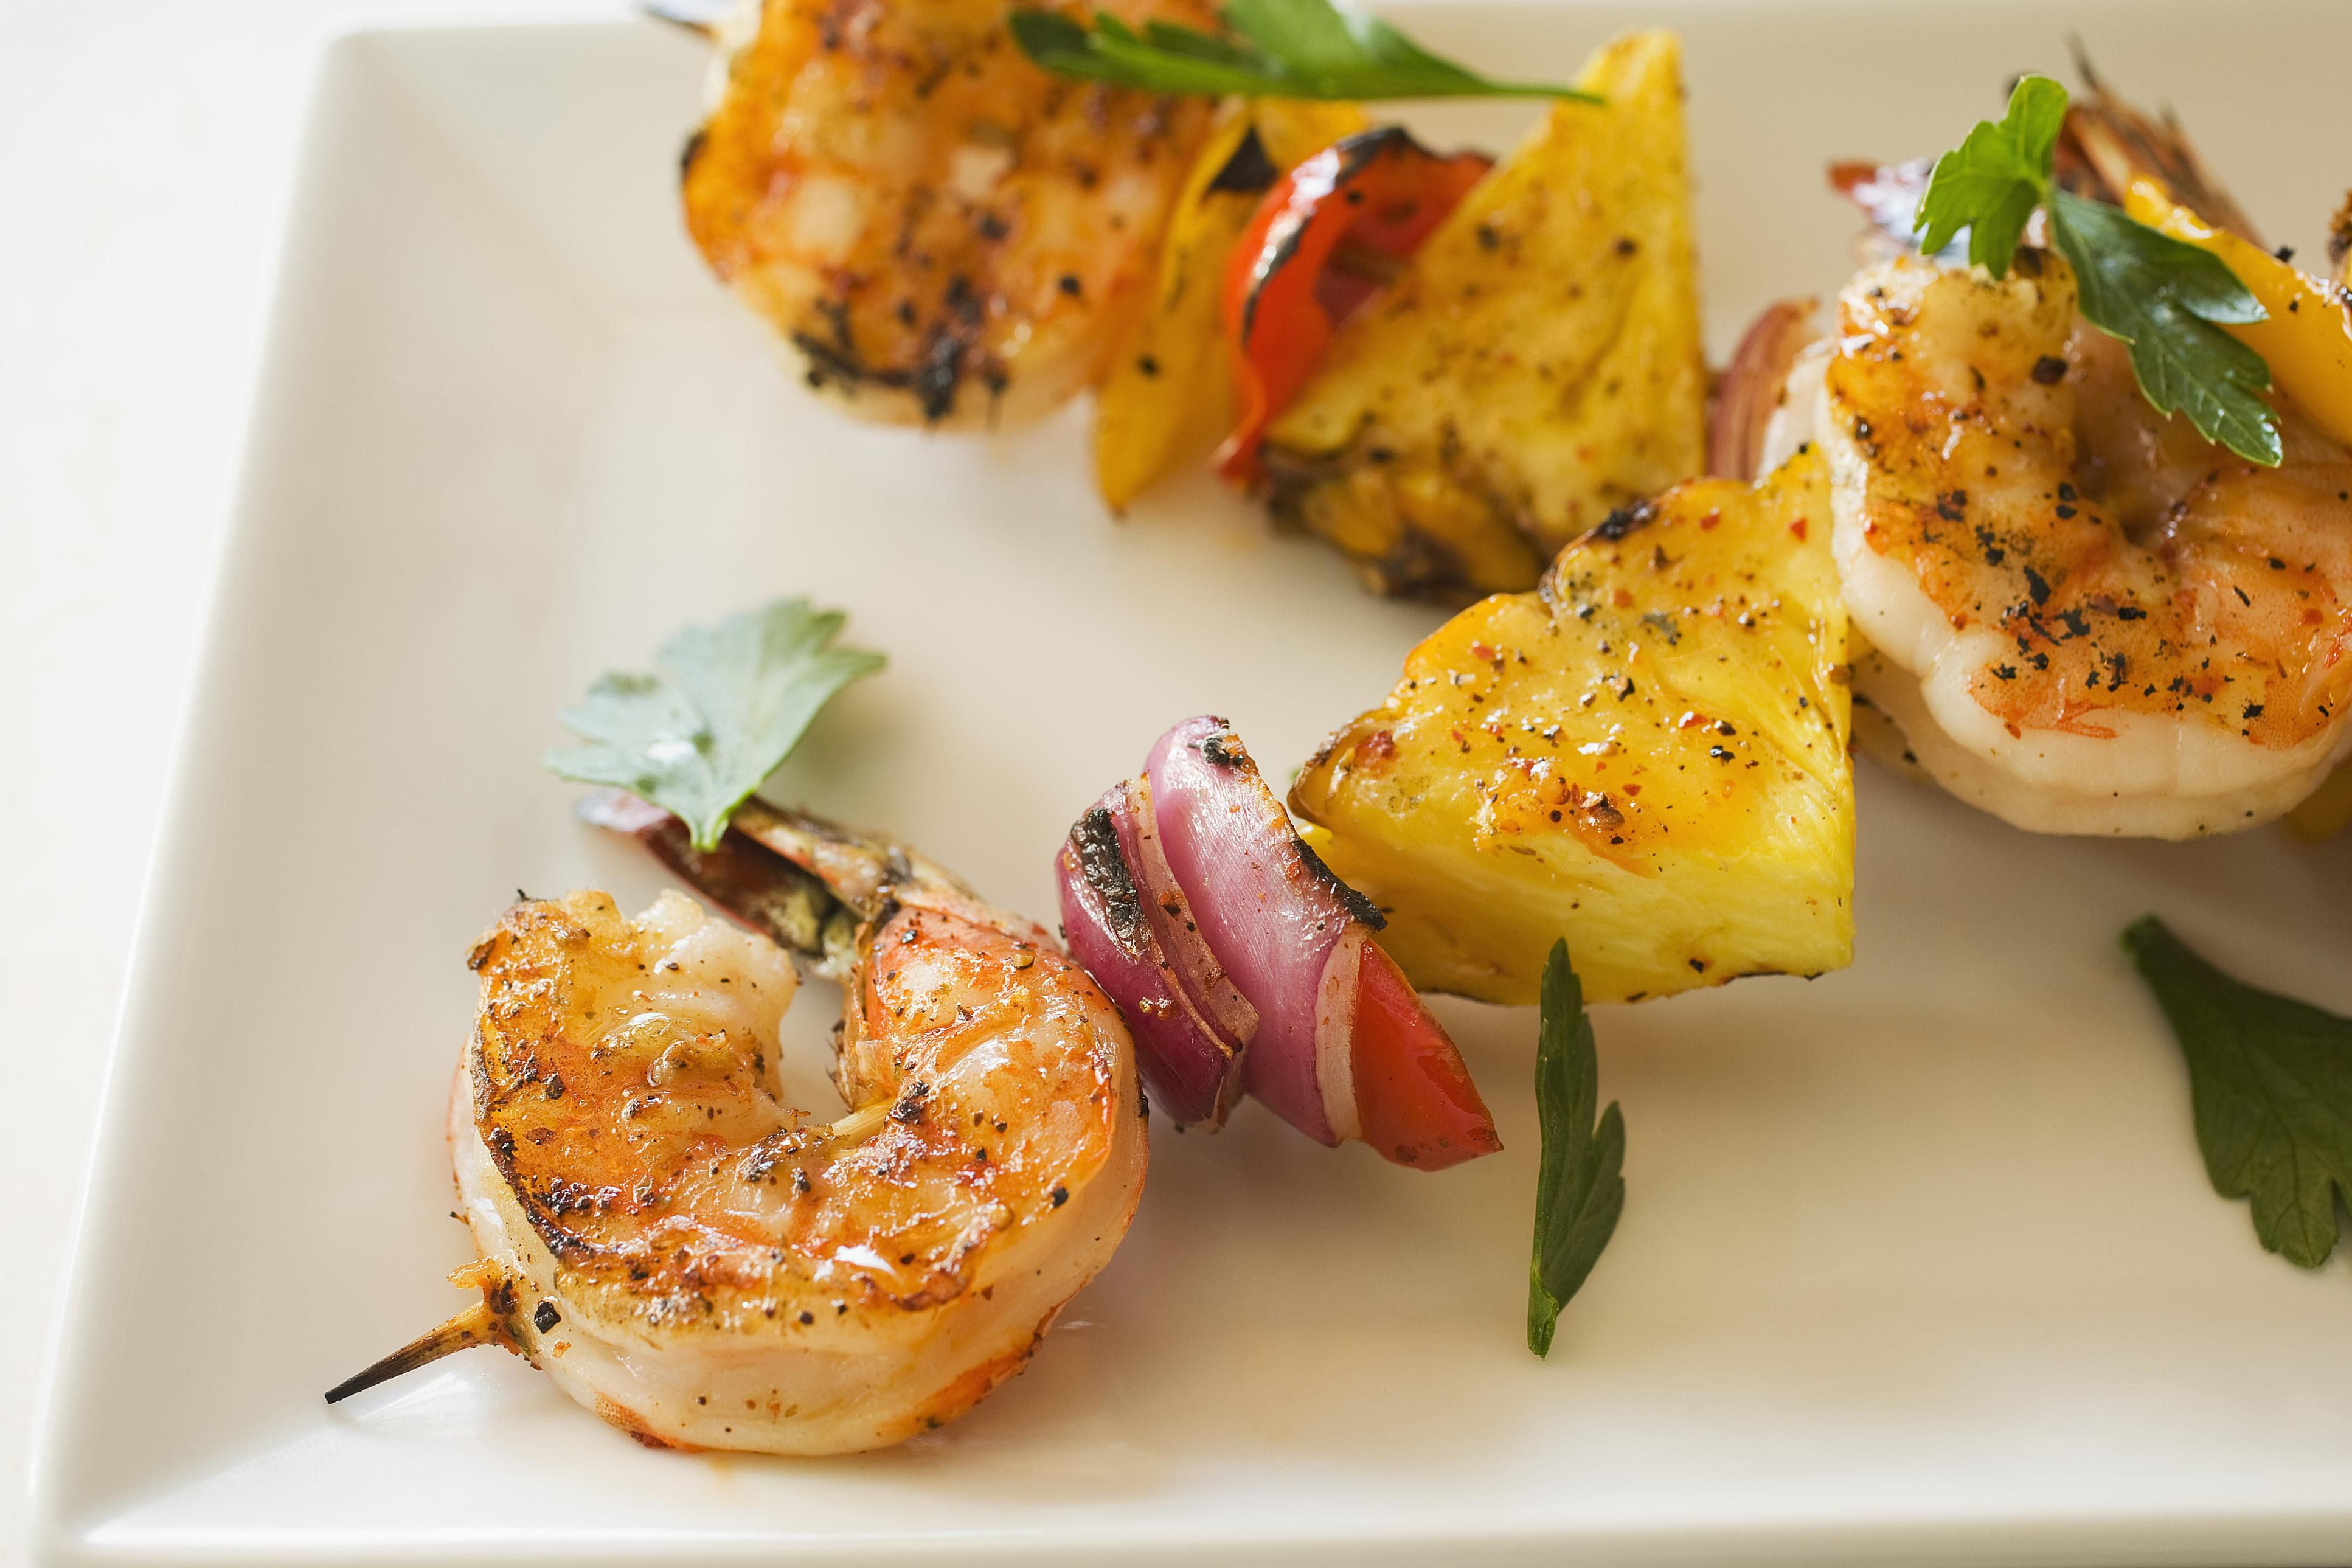 Pineapple-Chili Shrimp Kebabs